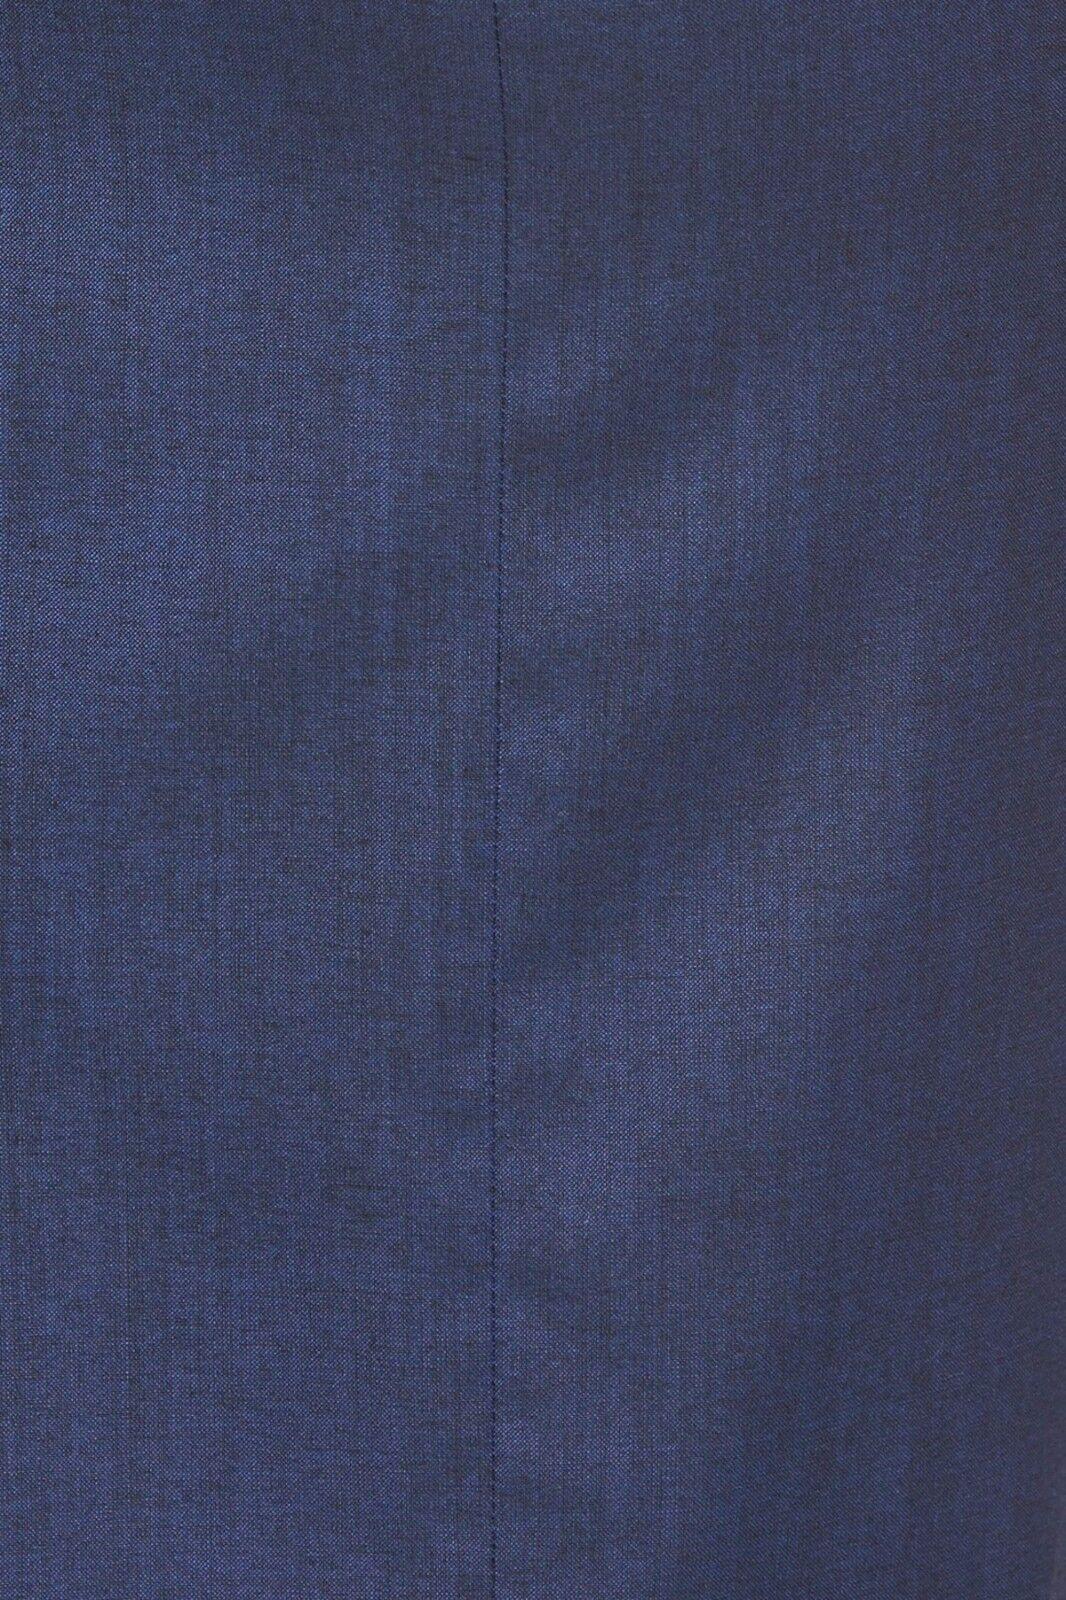 NWT BOSS by Hugo Boss Delura Stretch Wool Wool Wool Blend Sheath Dress bluee  545 – Size 0 cc8a42